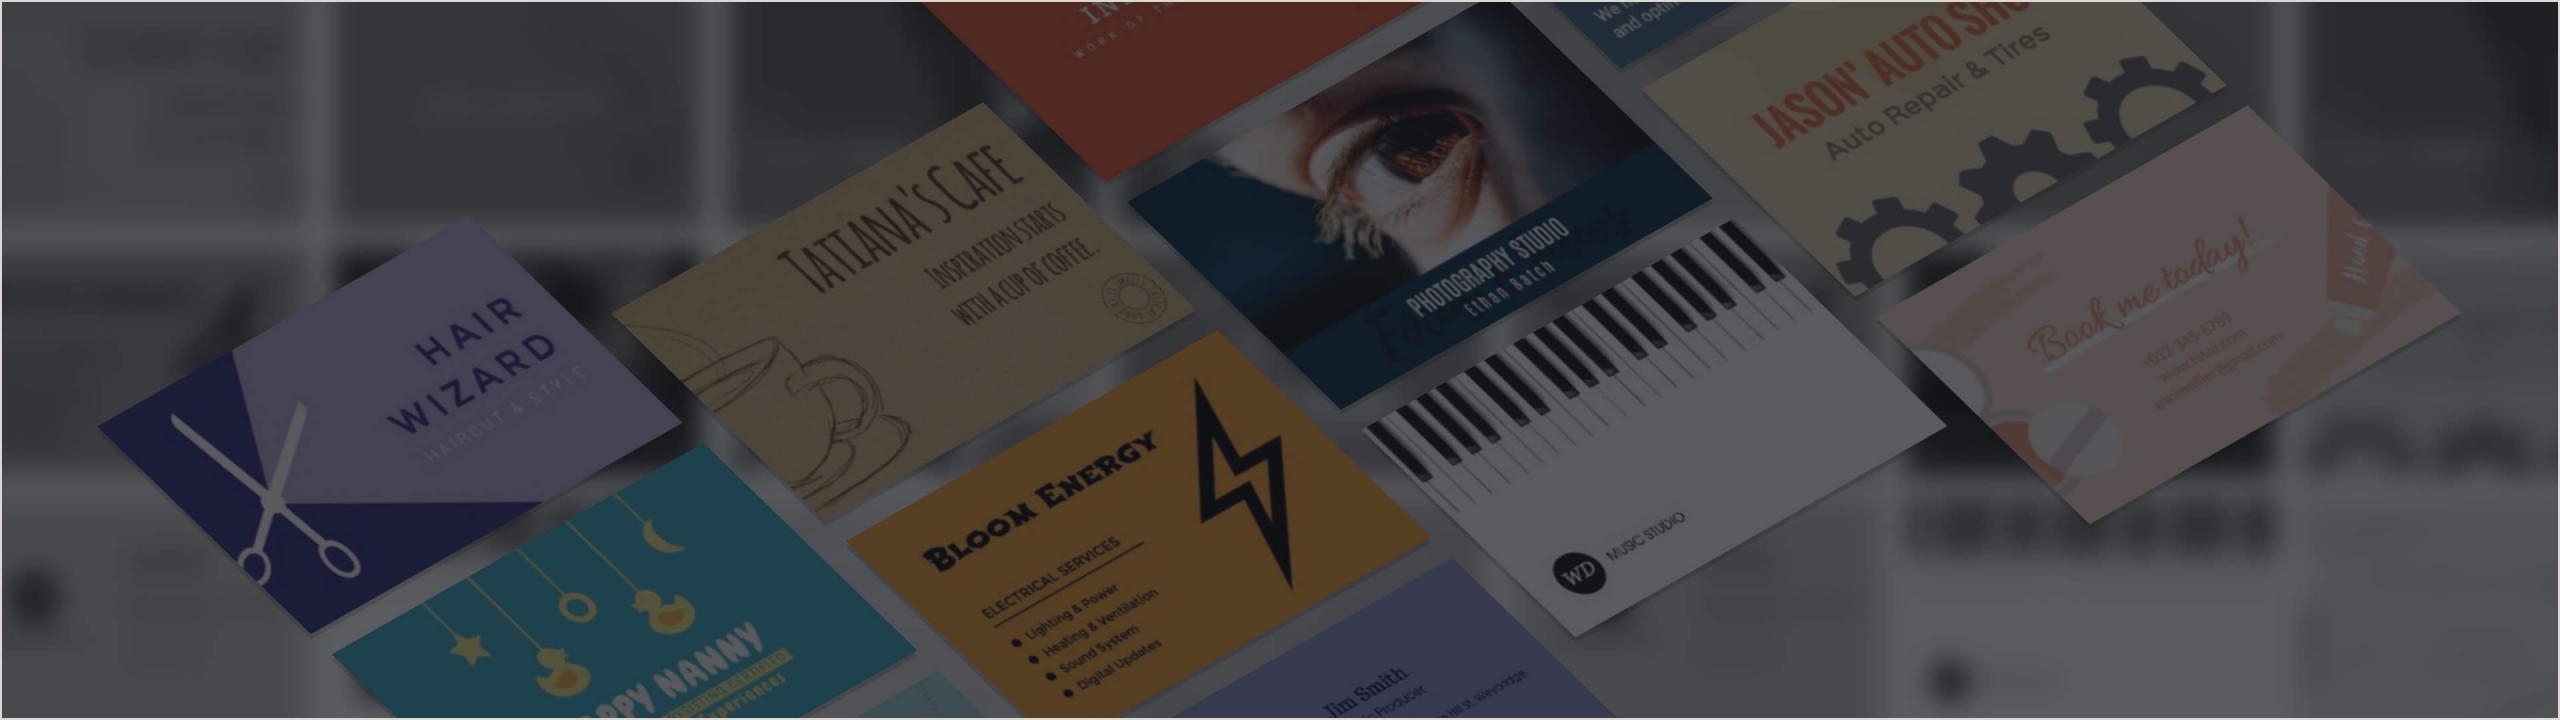 Best Business Cards Online 4 Color Process How To Make Business Cards With Free Business Card Maker